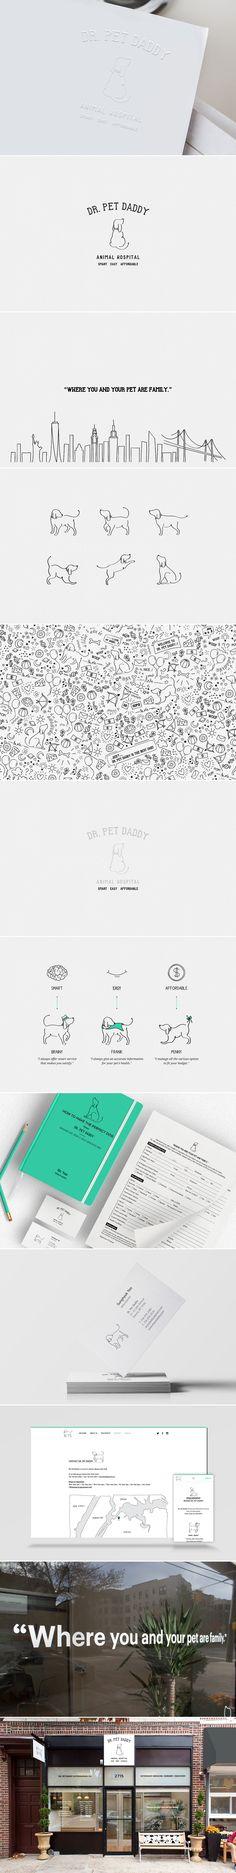 [ Dr. Pet Daddy ] [ Credit: Hyun Sul ] [ Graphic Design, Identity Design, Logo Design, Package Design, Editorial Design, Art Direction, Branding, Web Design, Photography, Interior Design, Illustration, Drawing ]